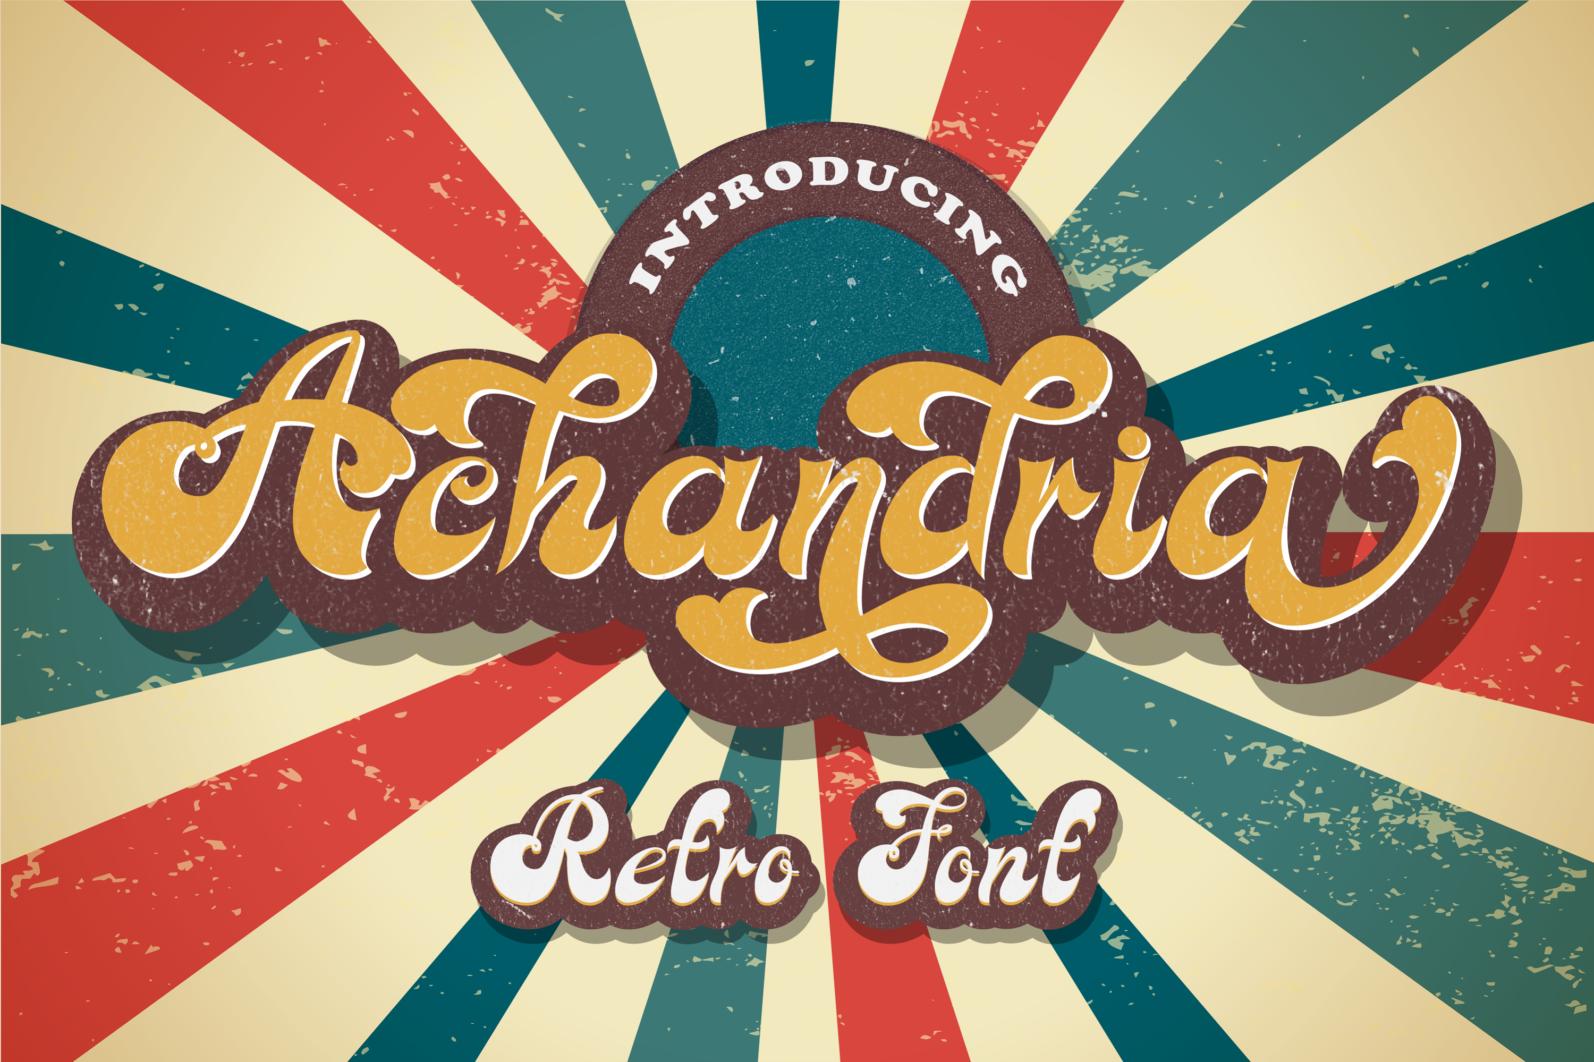 Achandria a Vintage Retro Font - 01 -